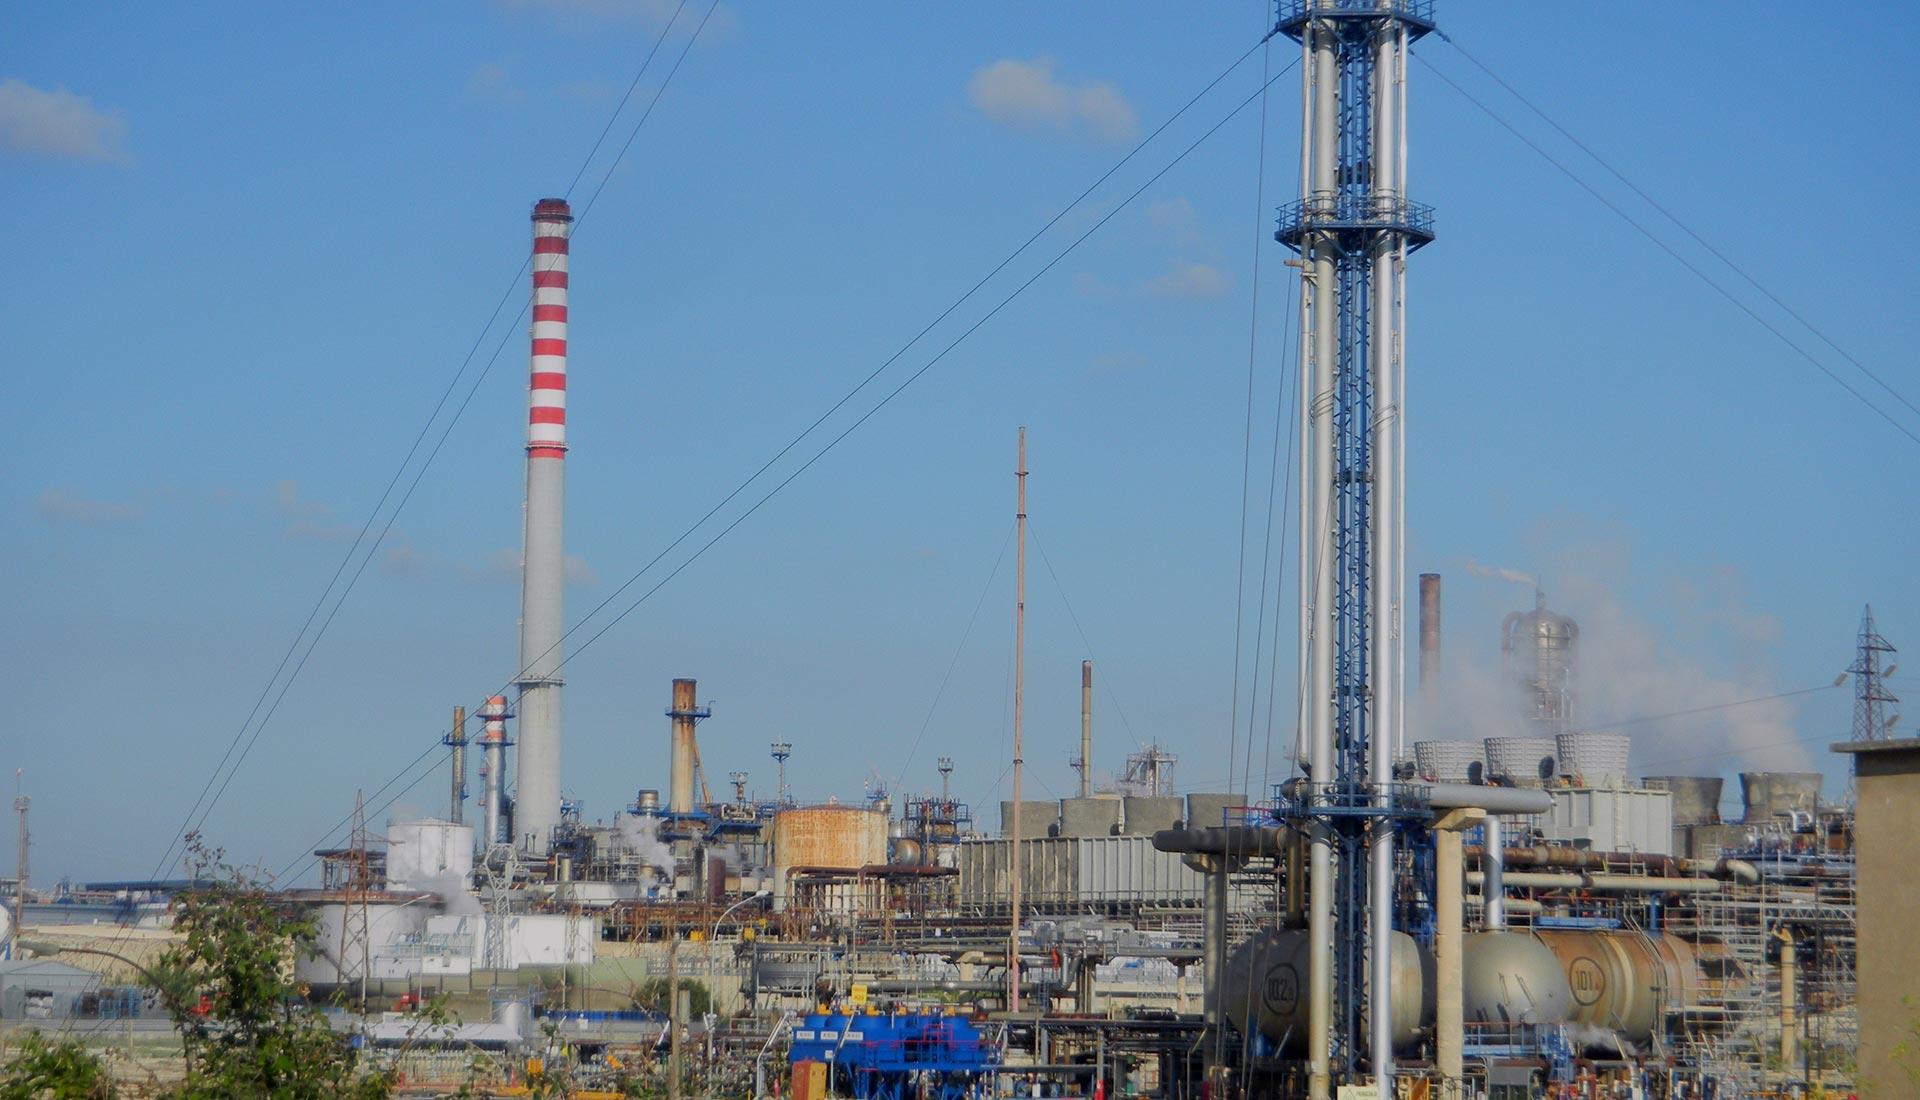 BSC Industriale